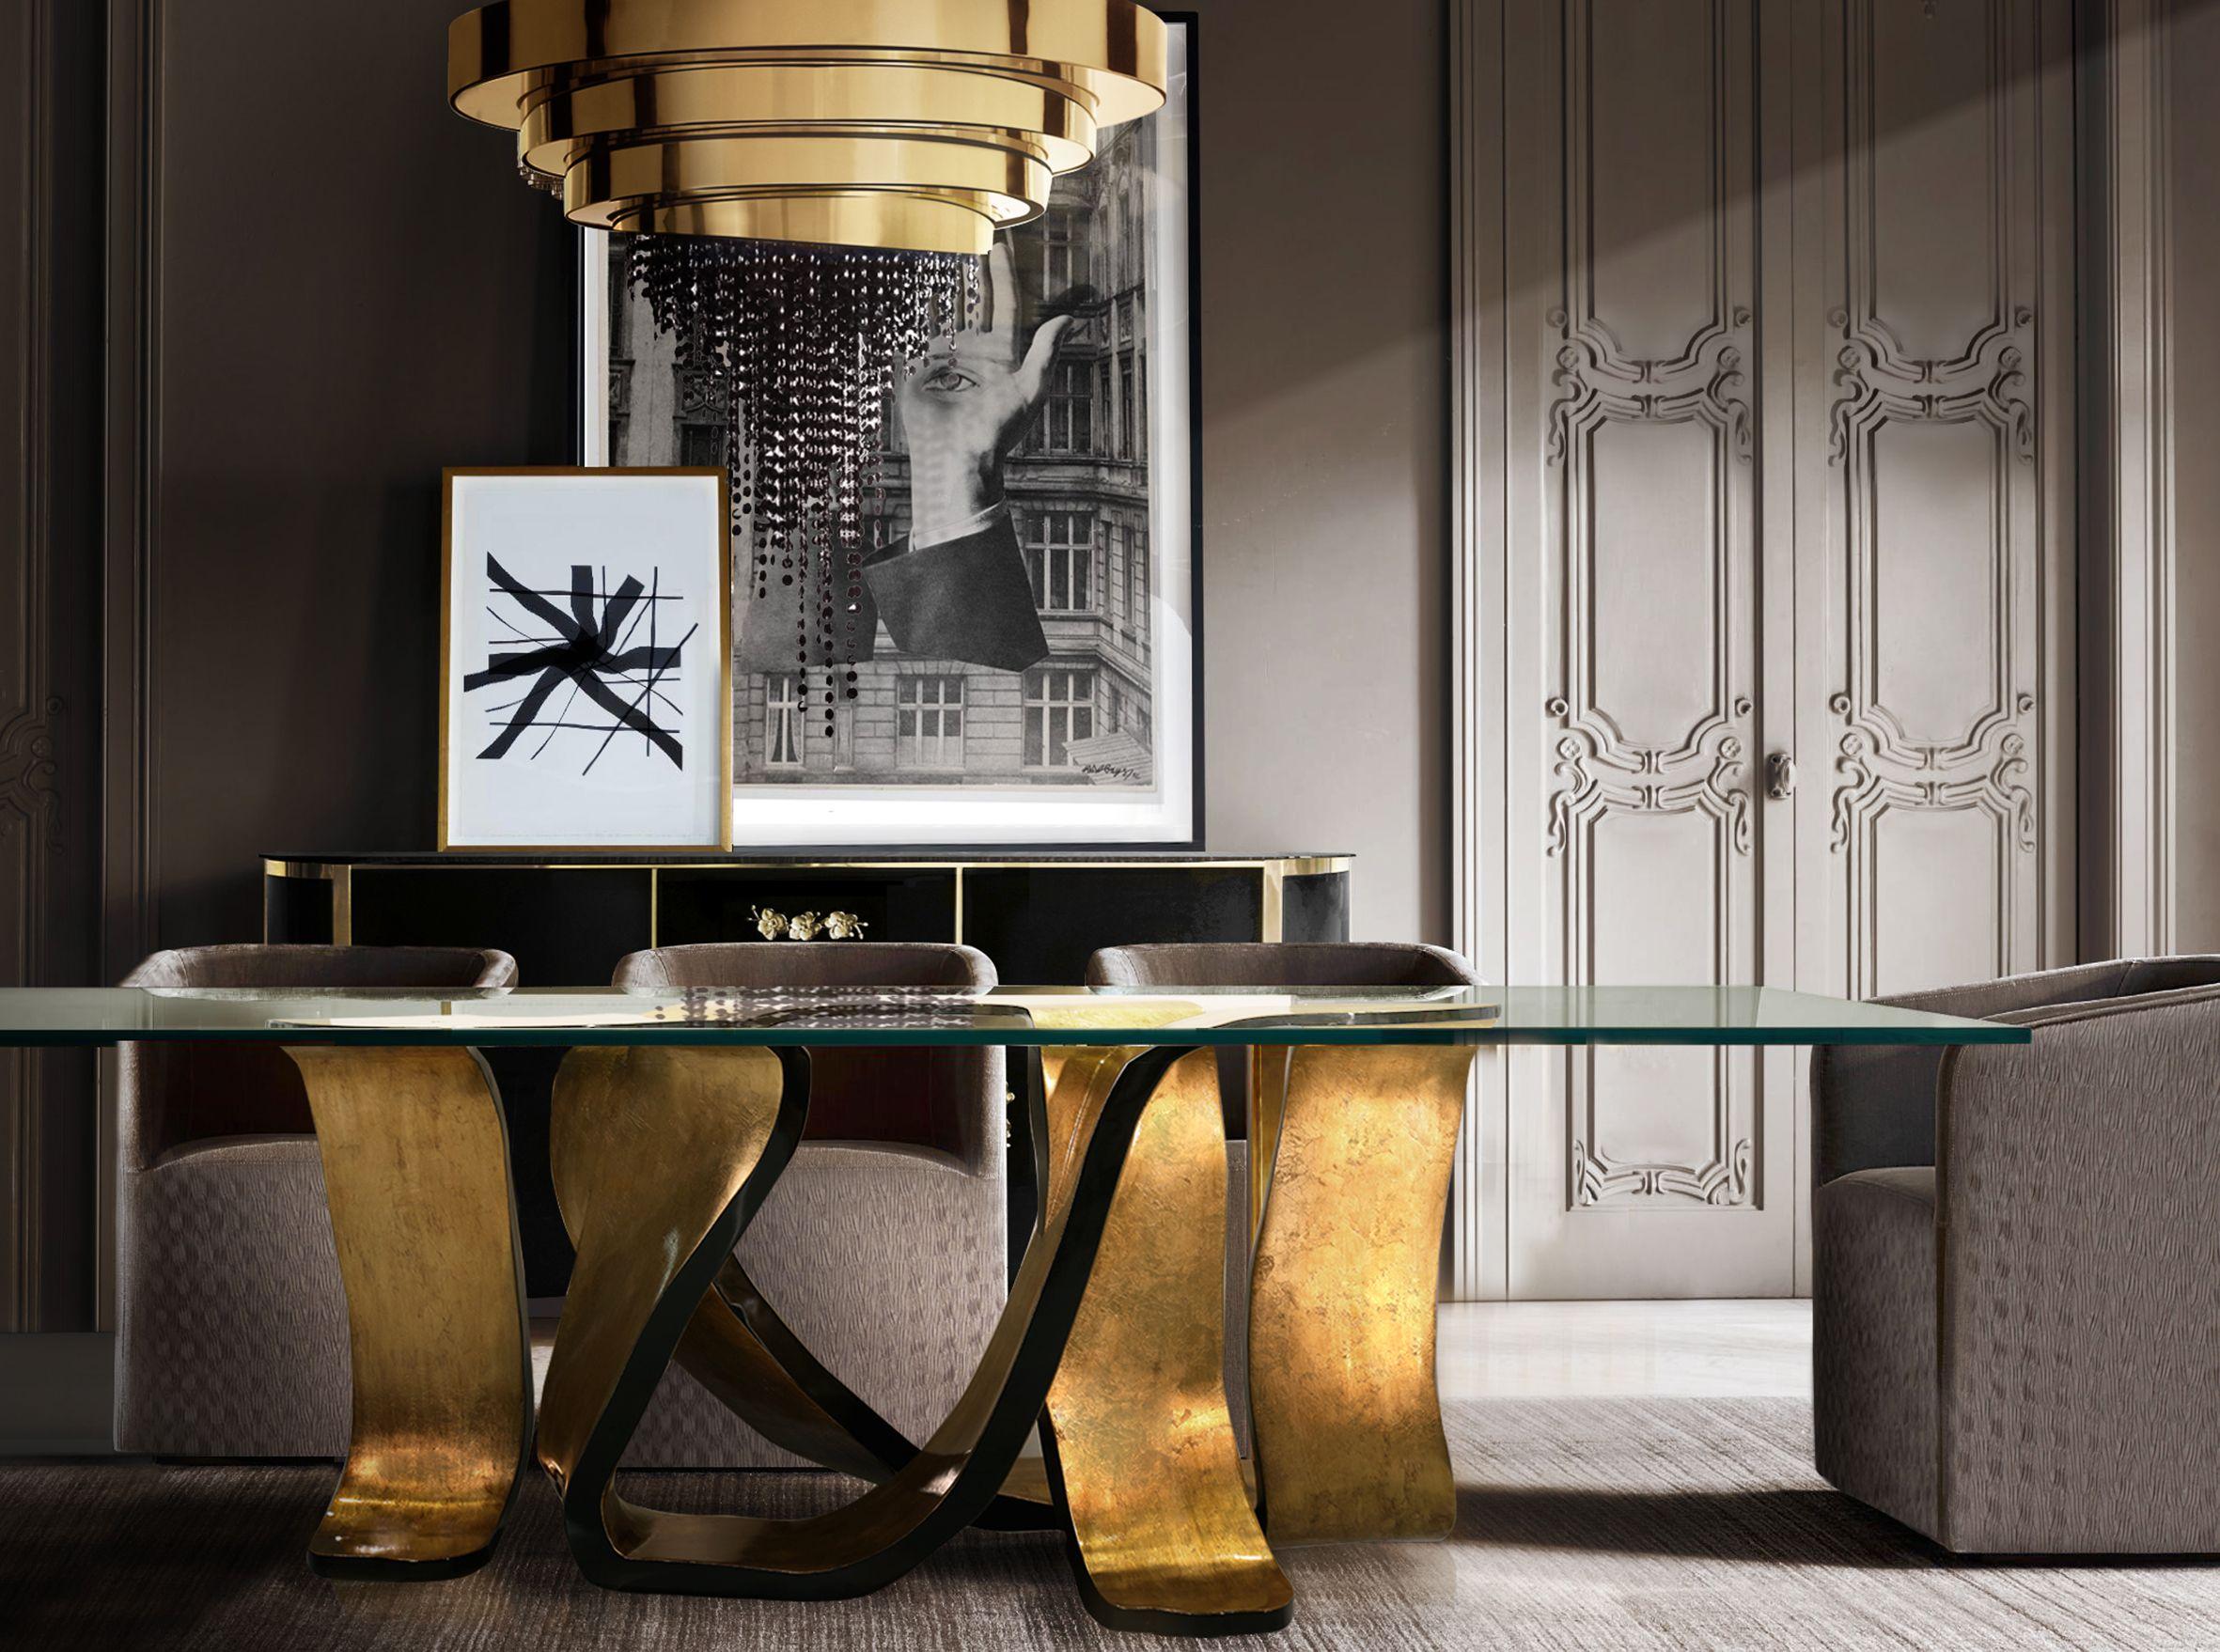 Exclusive pieces of furniture by Covet House | Design Inspiration | Luxury Interior Design  www.bocadolobo.com #bocadolobo #luxuryfurniture #exclusivedesign #interiordesign #designideas #partnerbrands #interiordesignstyles #housedesignideas #moderninteriordesign #modernhouseinteriordesign #contemporaryinteriordesign #interiorinspiration #homedecor #homedesign #home&decor #modernroom #inspirationfurniture #bespokedesign #bespoken #interiorinspiration #luxuryinteriordesign…